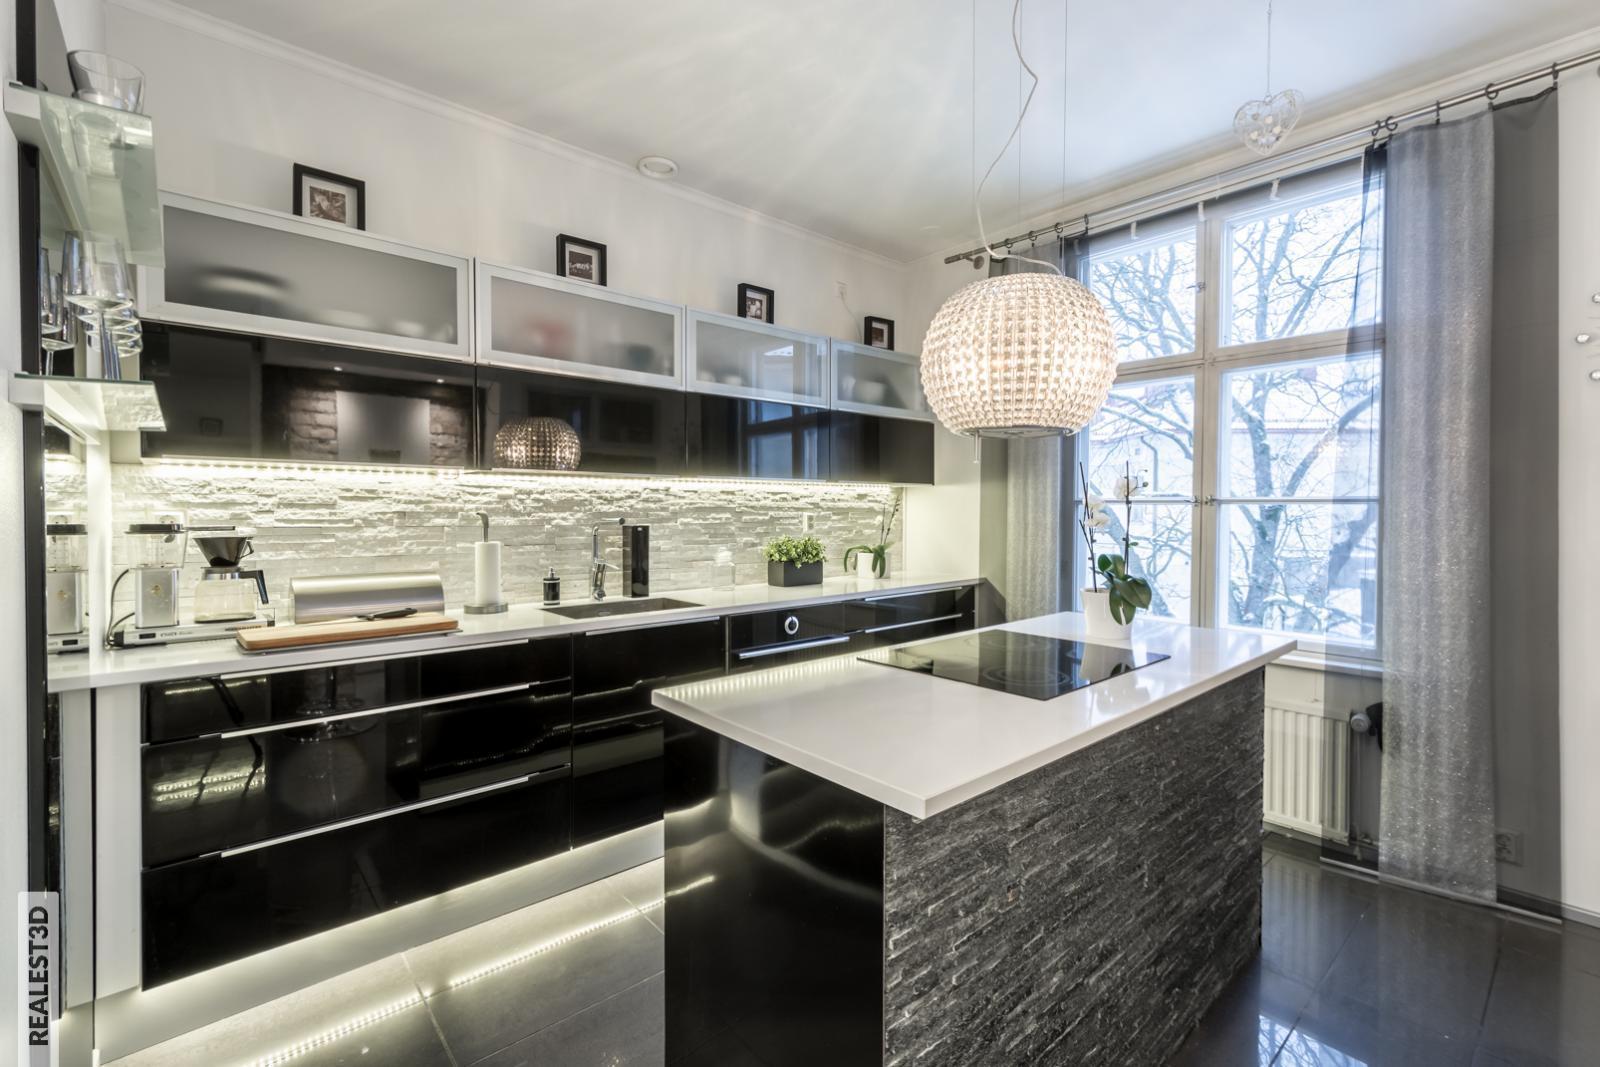 Moderni keittiö 7669023  Etuovi com Ideat & vinkit